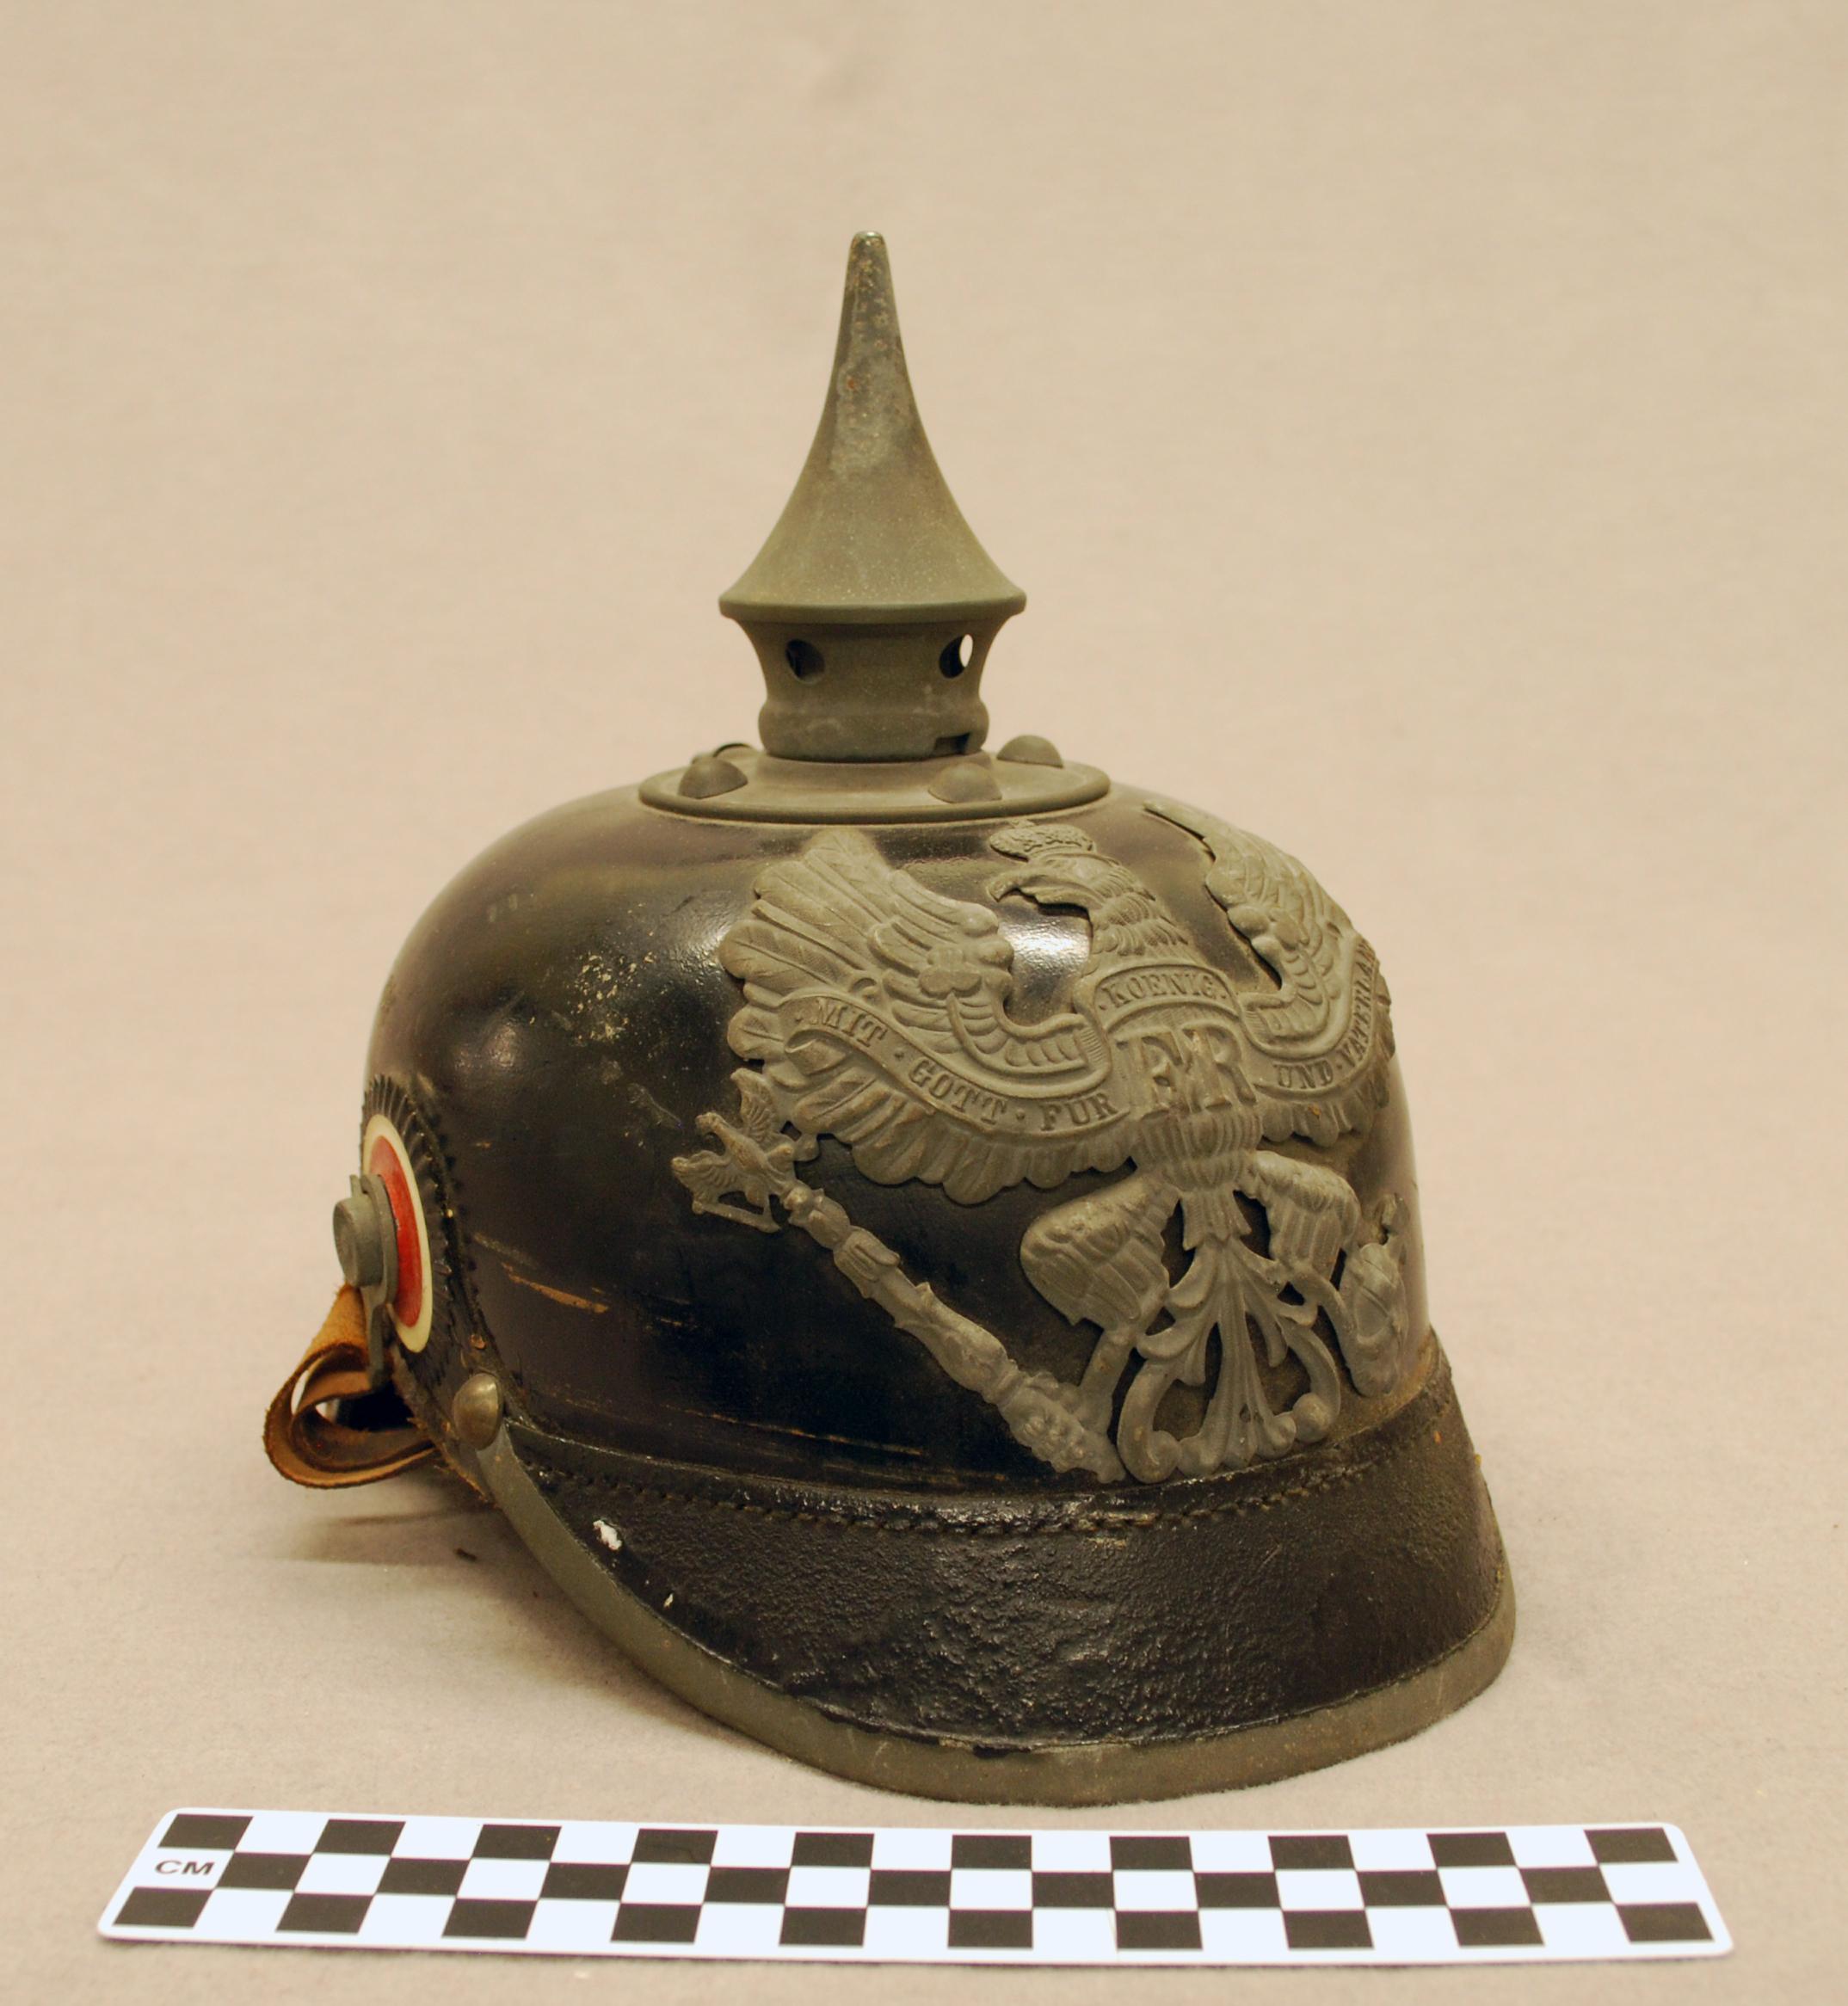 Object: Helmet | UTSA Institute Of Texan Cultures